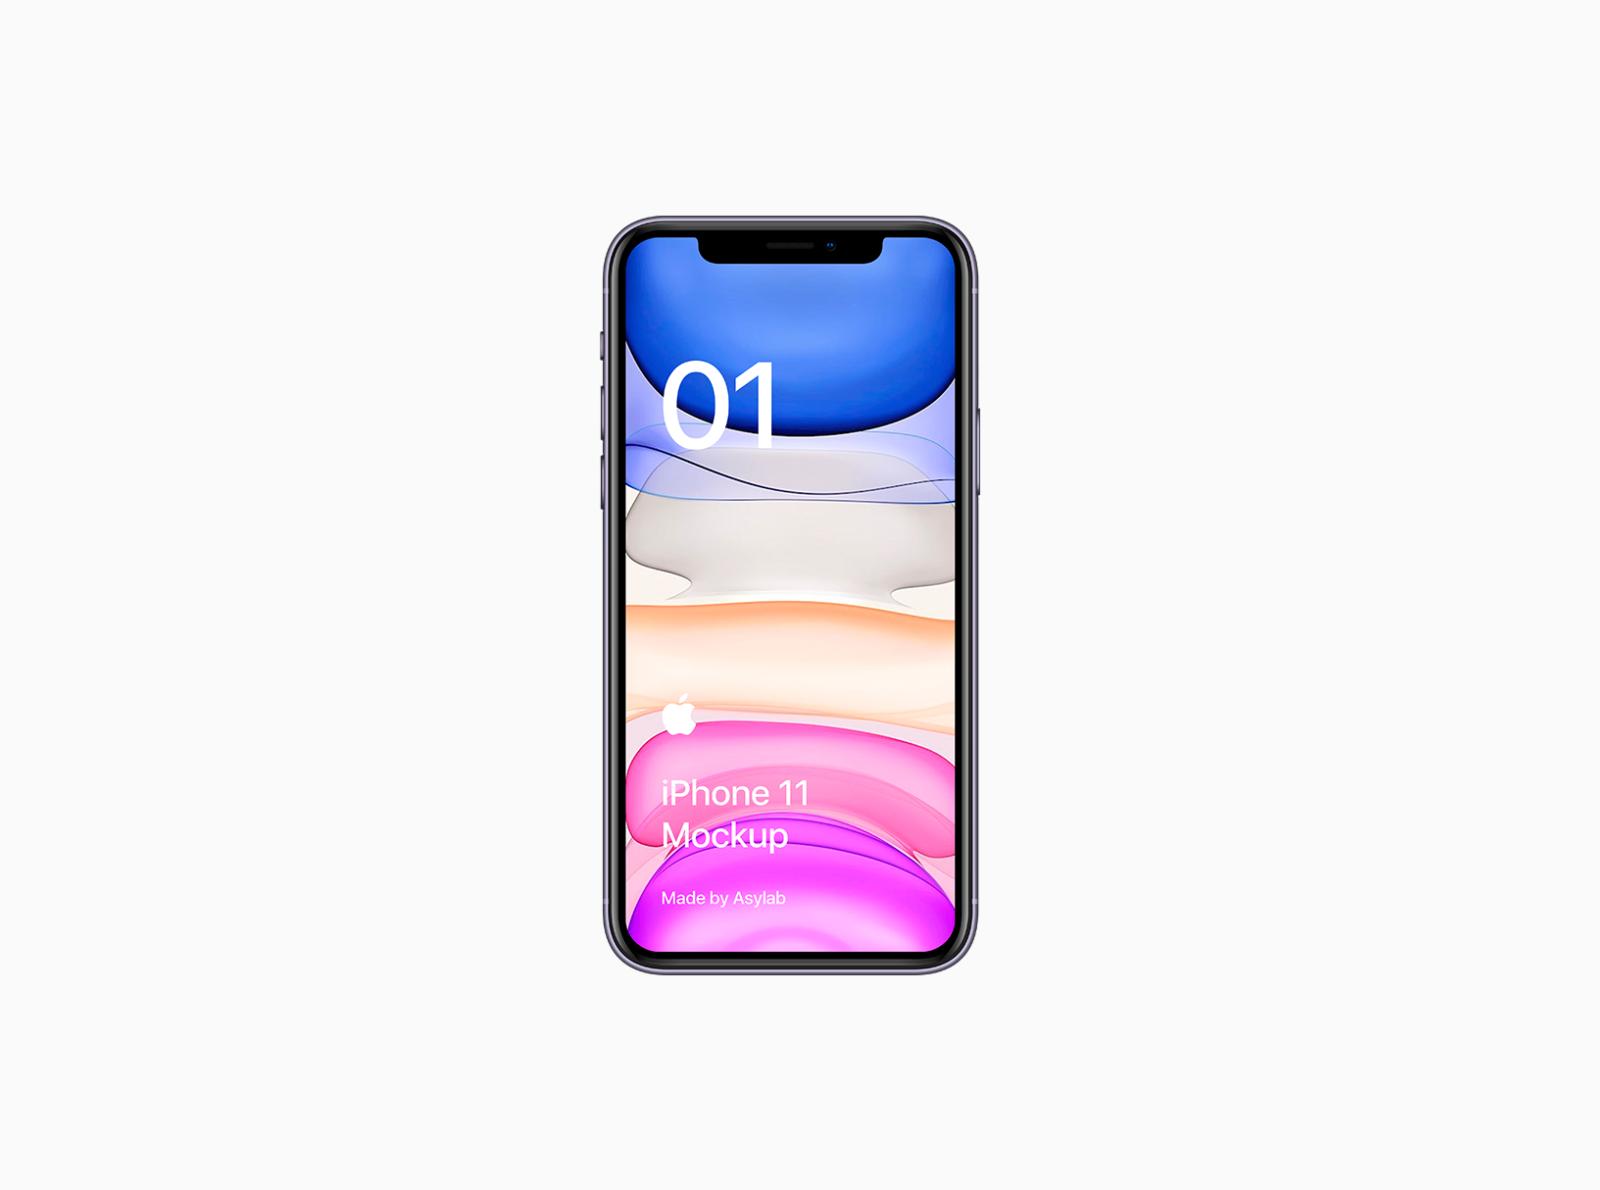 Freebie Iphone 11 Mockup Psd By Asylab On Dribbble